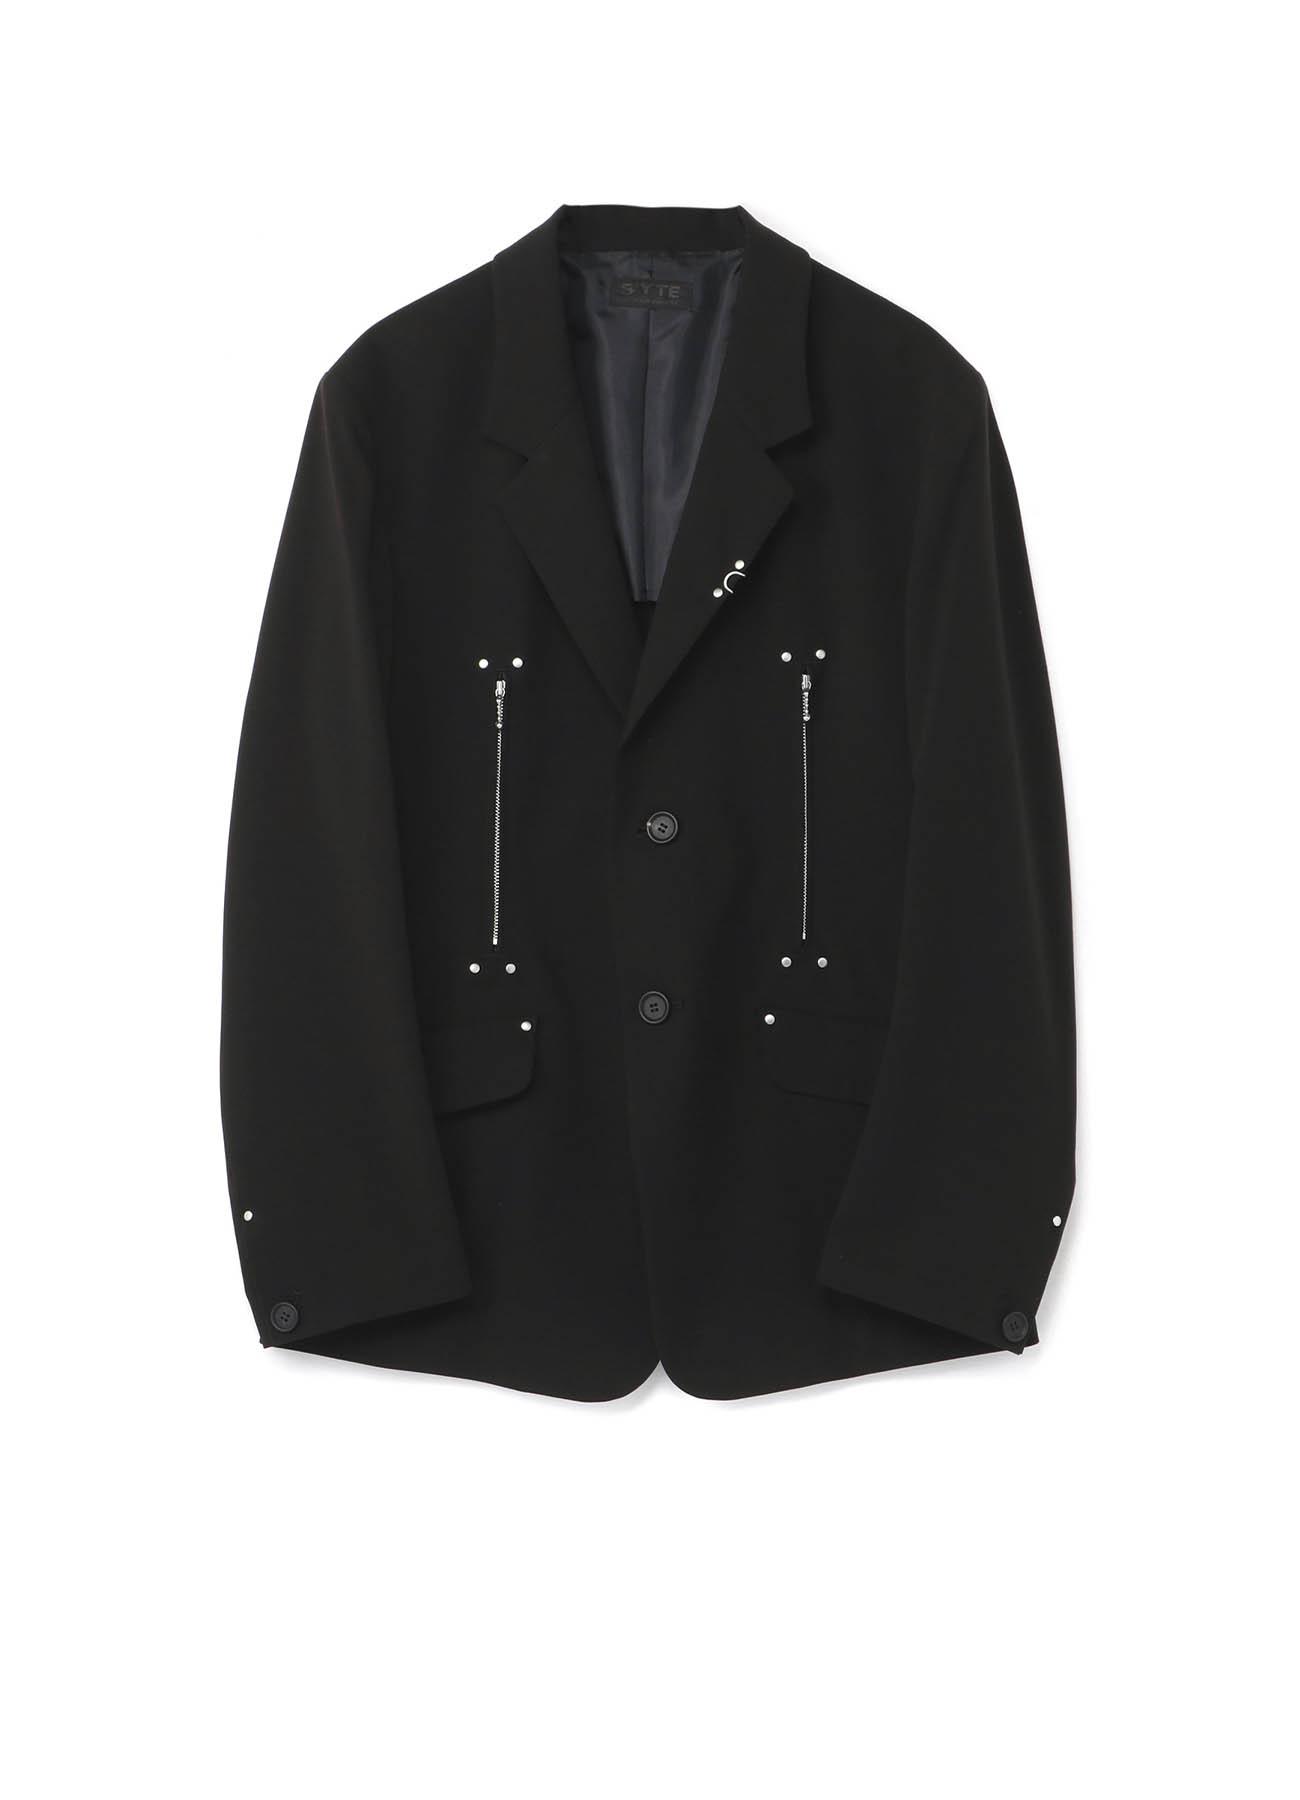 Pe/Rayon Gabardine Stretch 2BS Studs Jacket